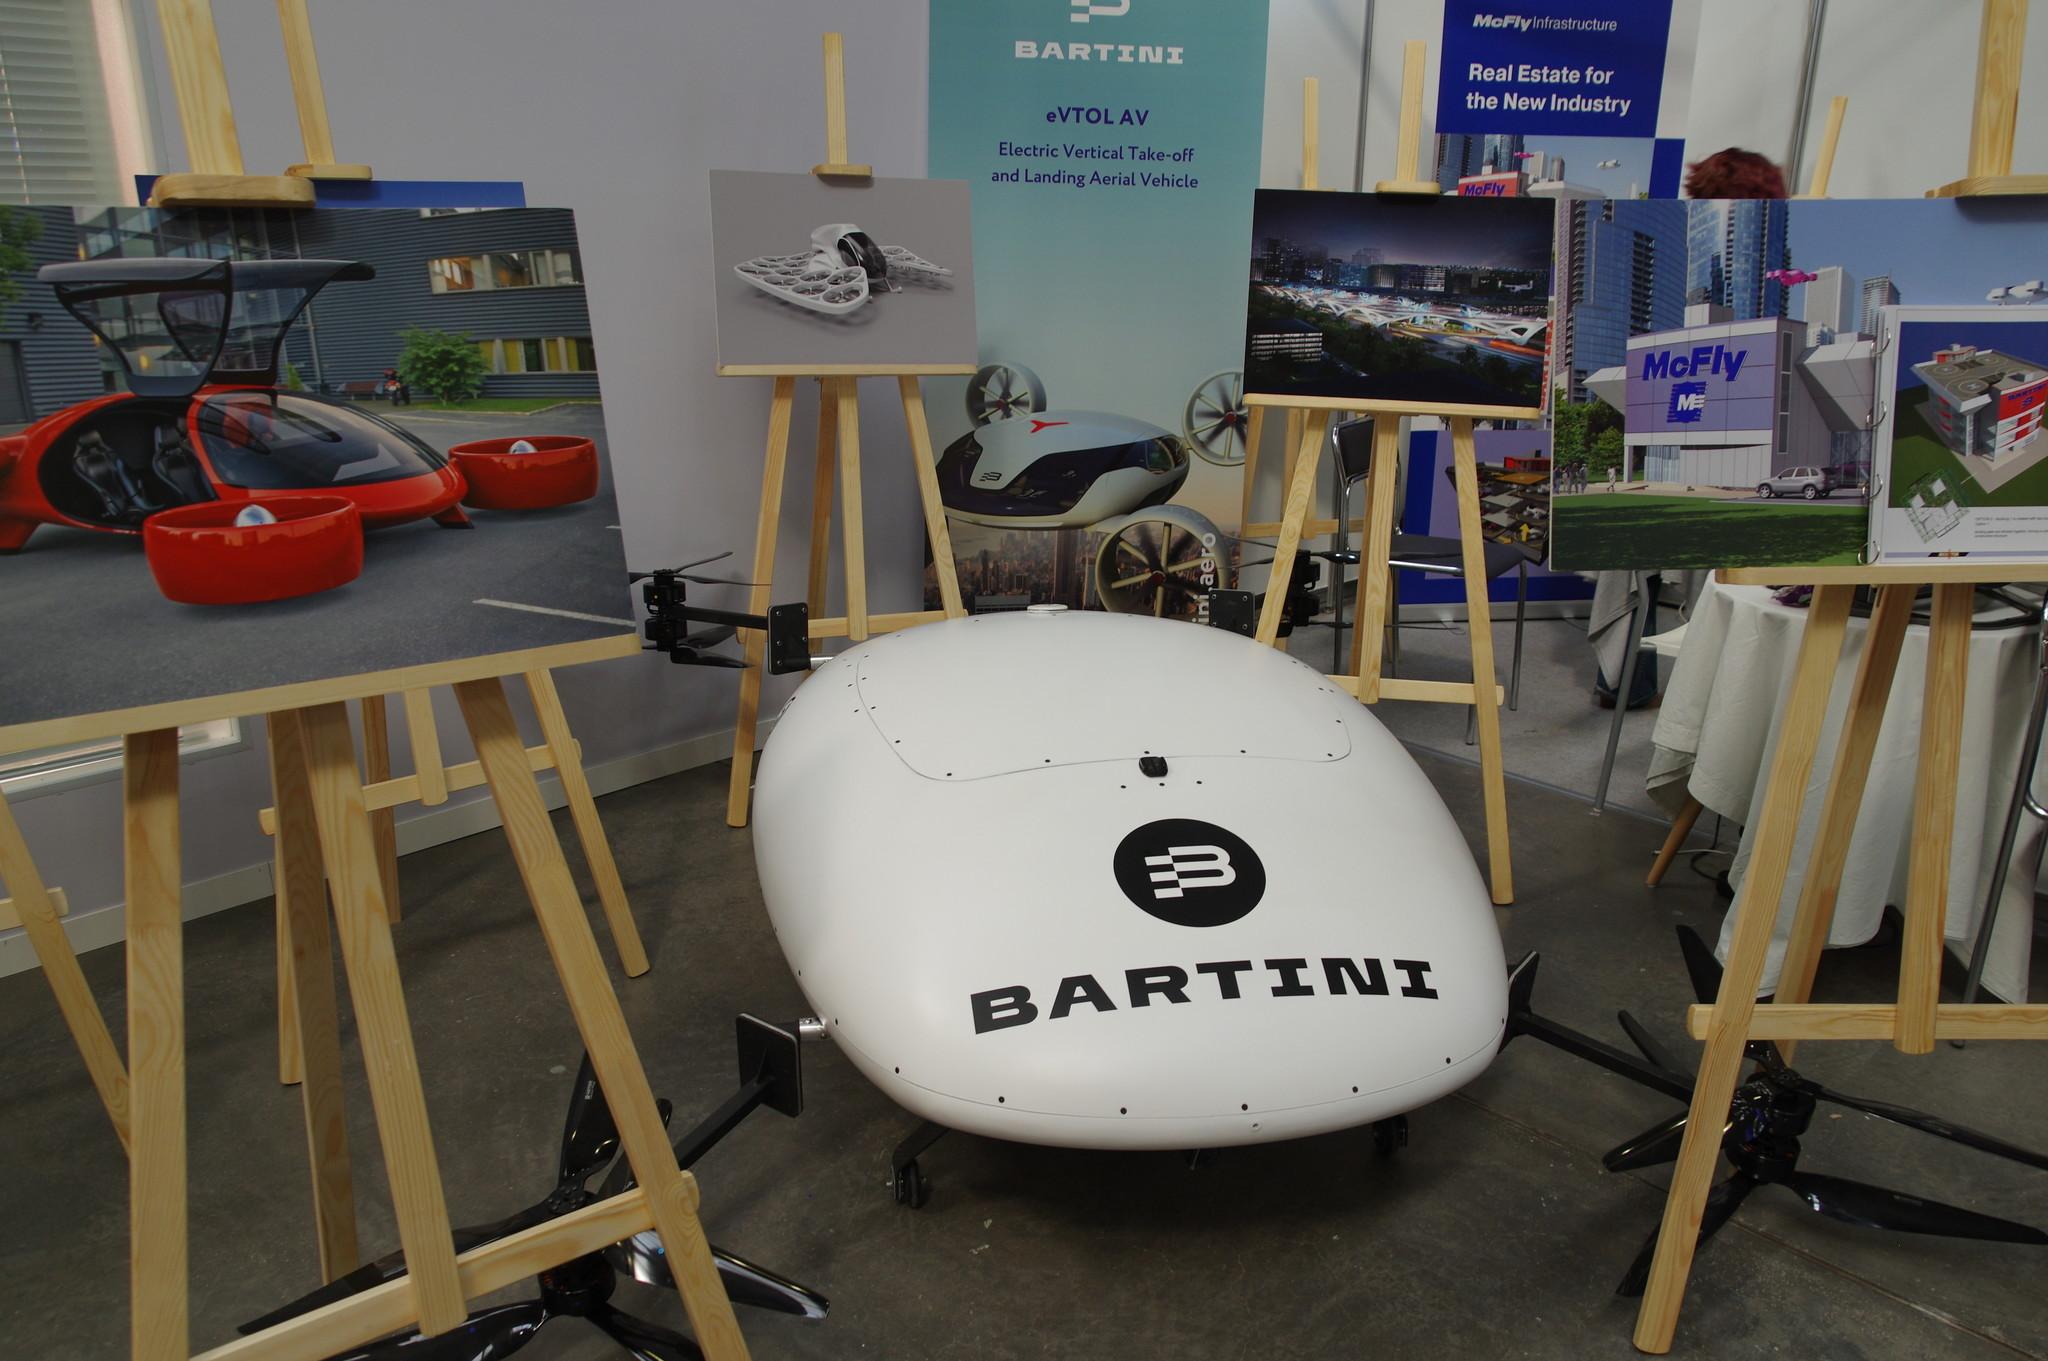 Проект воздушного беспилотного такси Bartini